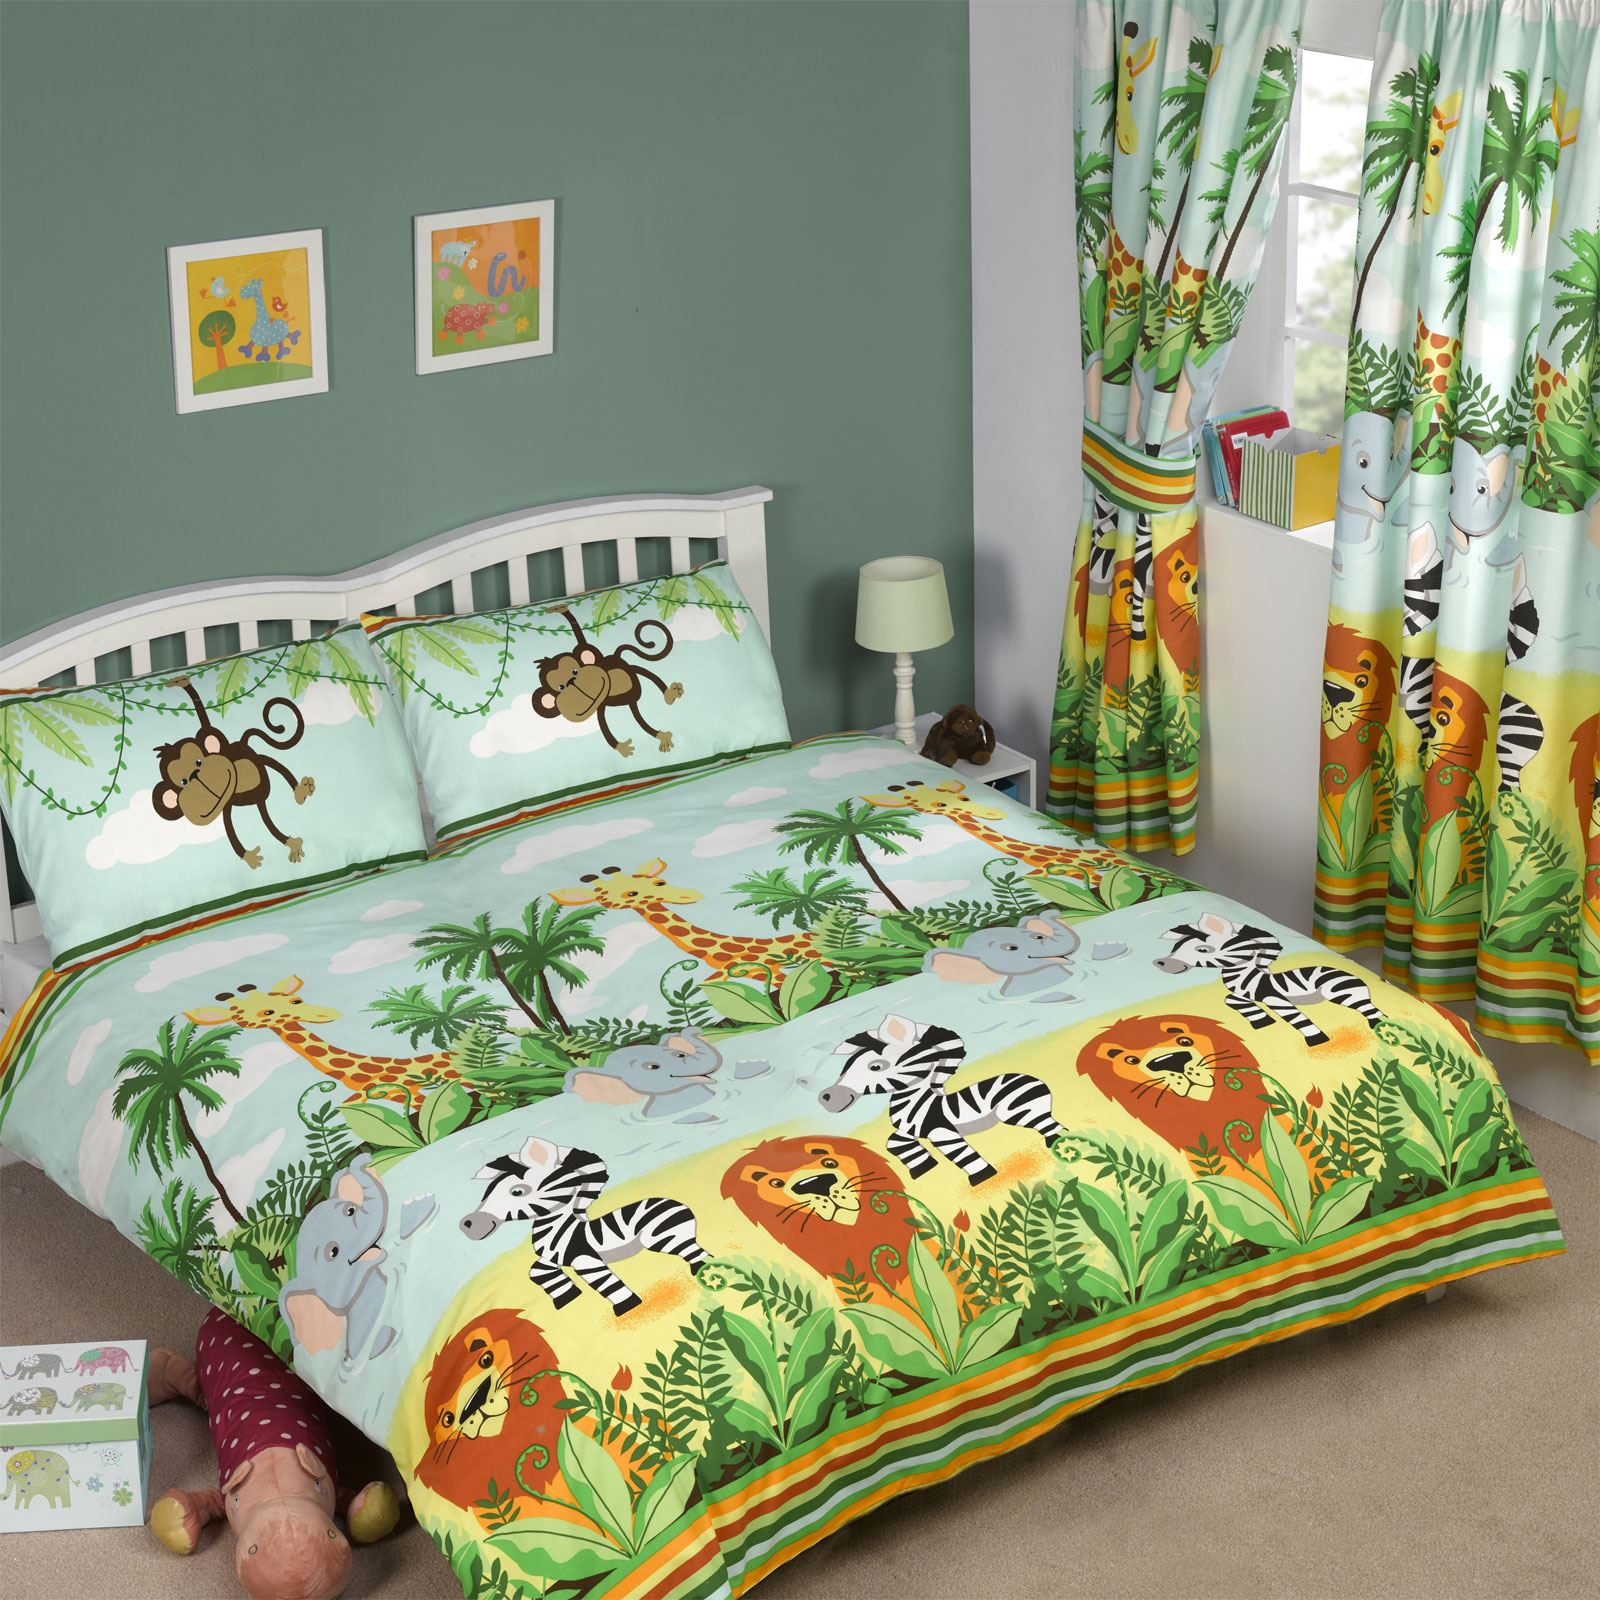 JUNGLE TASTIC ANIMAL THEMED BEDDING BEDROOM SINGLE TODDLER. JUNGLE TASTIC ANIMAL THEMED BEDDING BEDROOM   SINGLE  TODDLER  amp